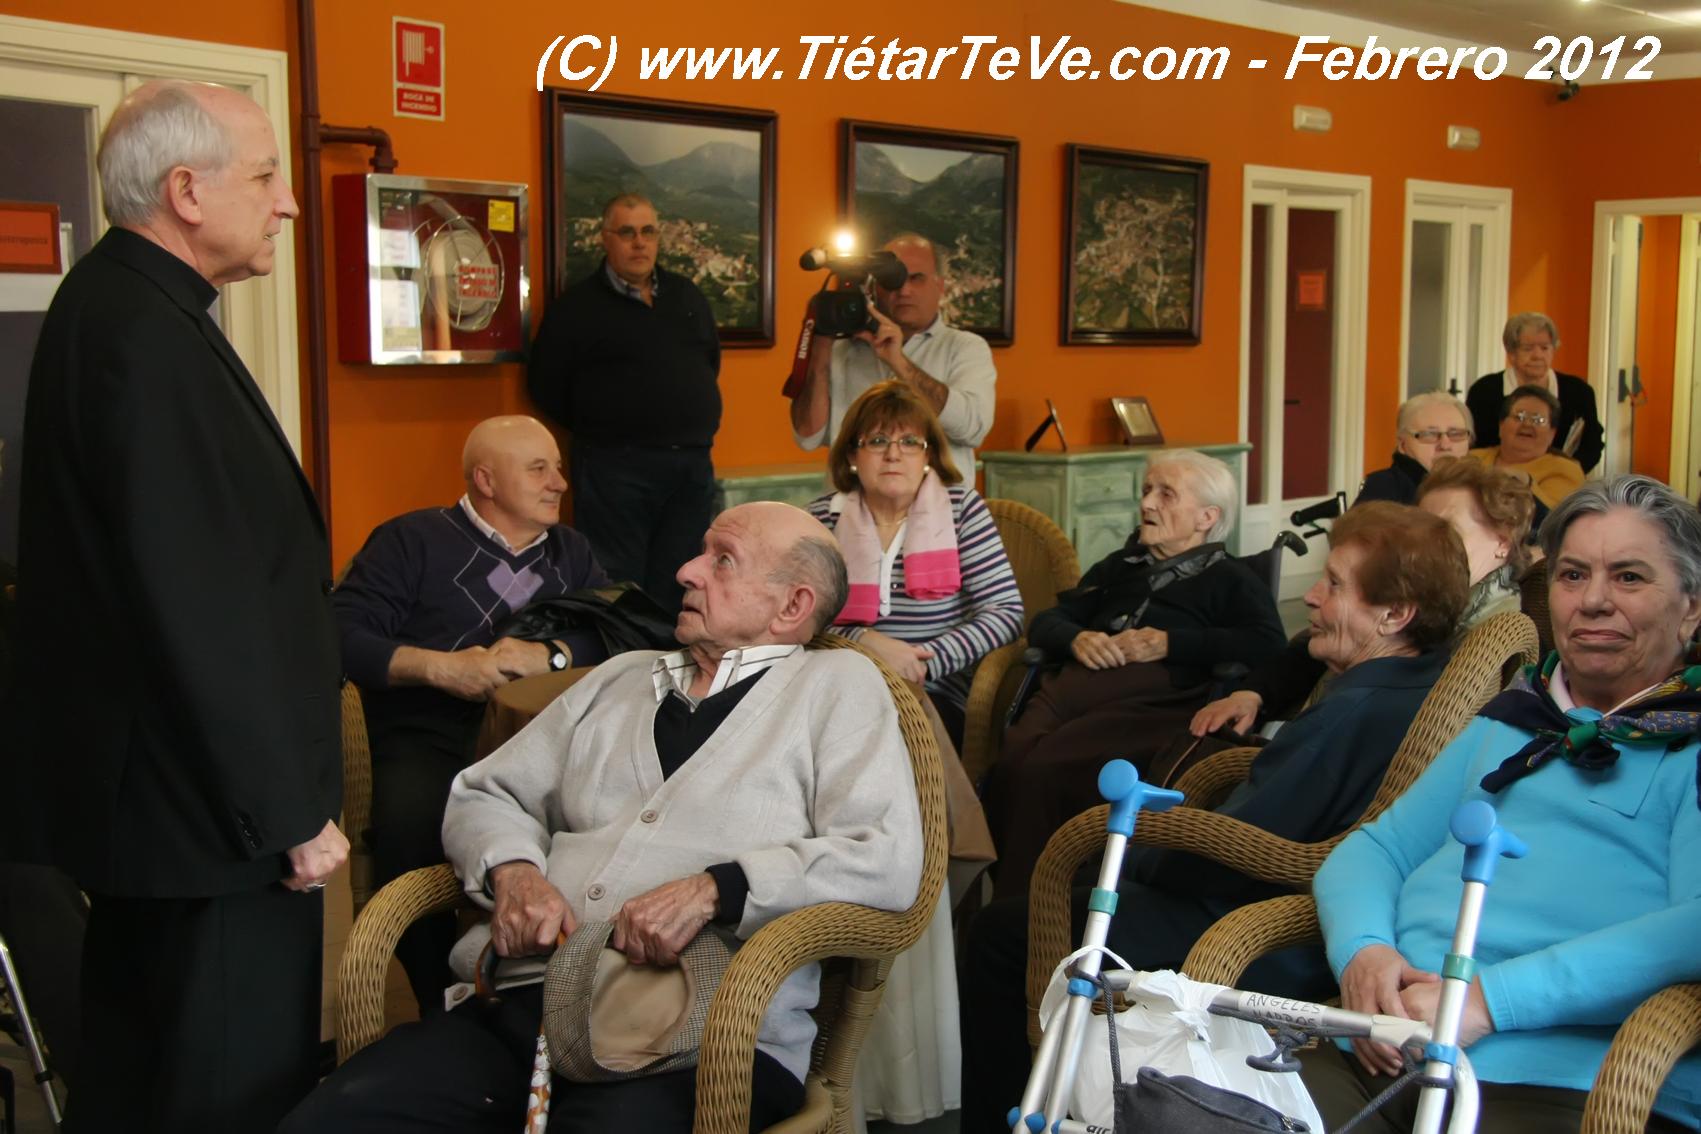 Visita del Obispo de Ávila a la Residencia San Andrés